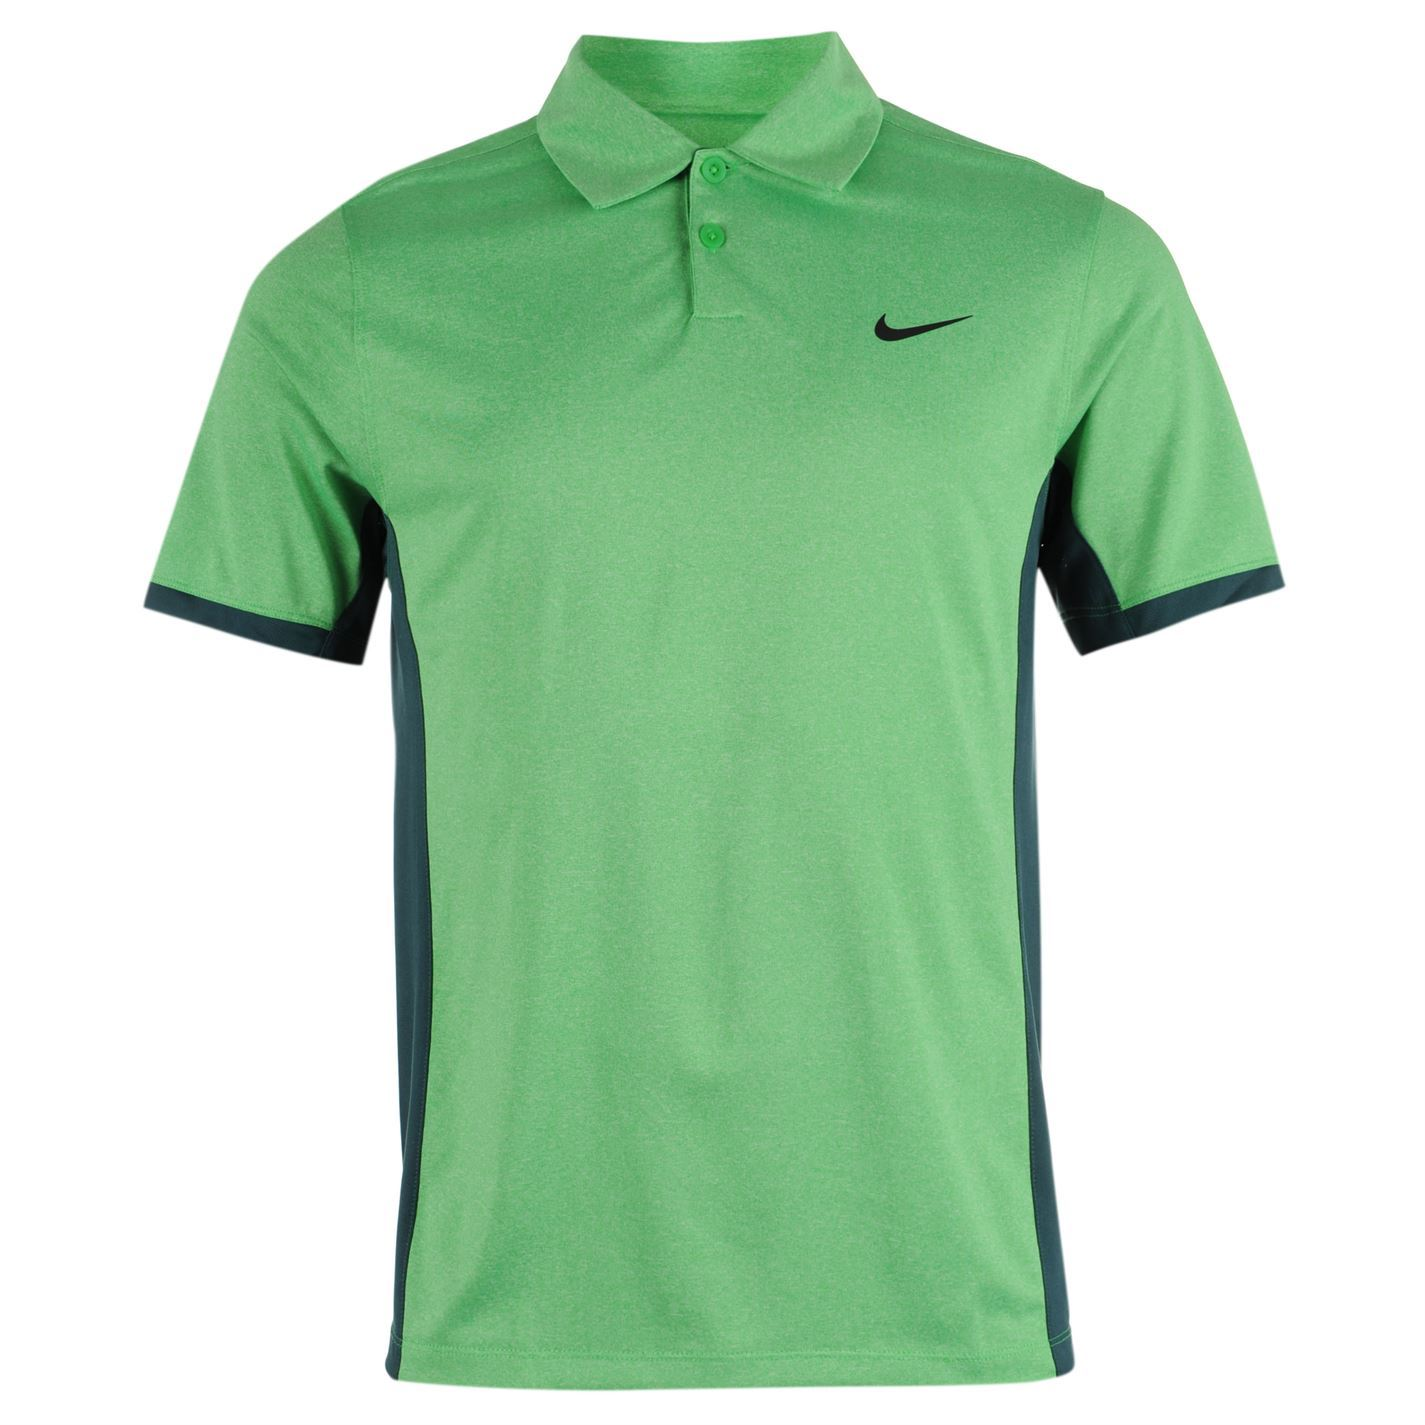 Nike mens victory block golf polo shirt short sleeves tee